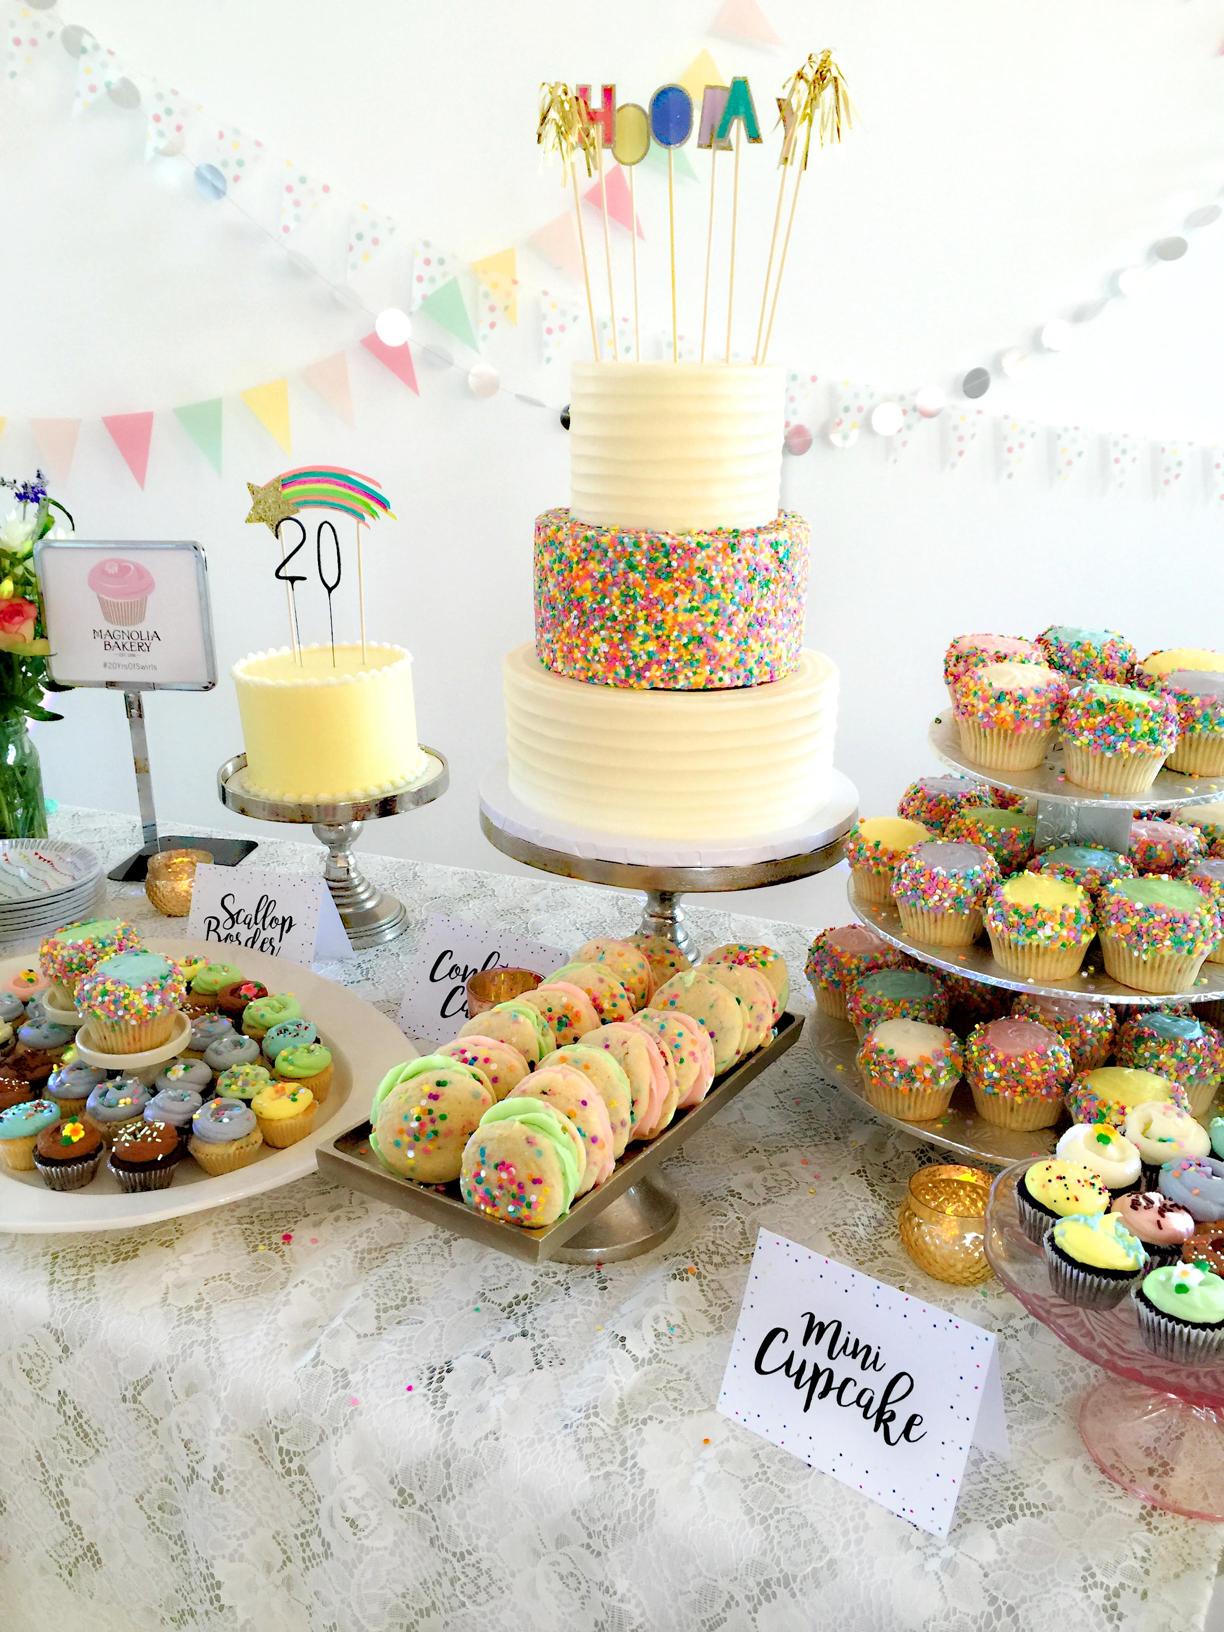 Every birthday party needs cake.